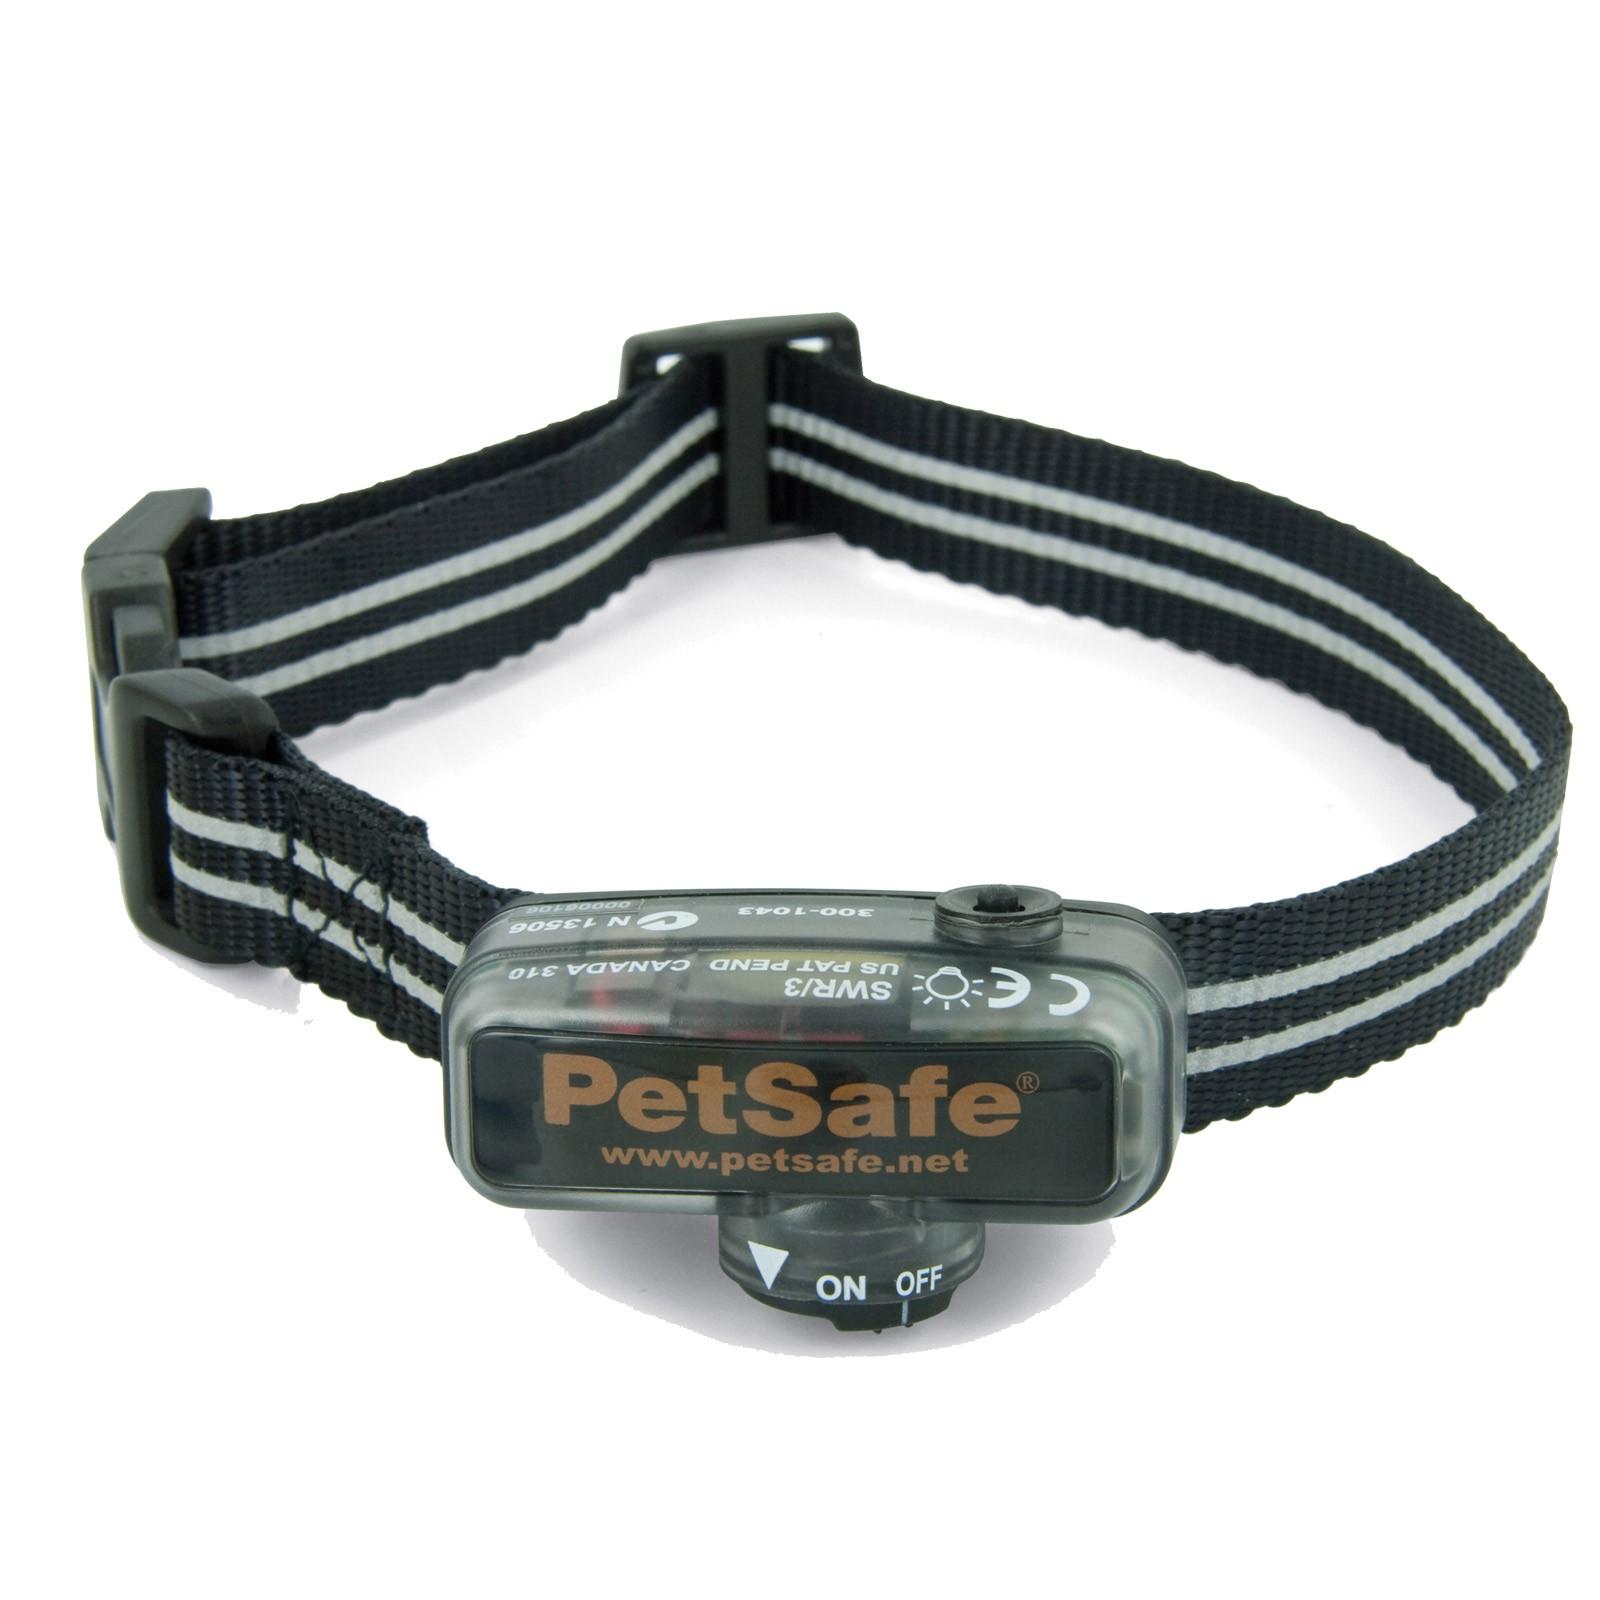 PetSafe Hunde Trainer Erziehungshalsband für kleine Hunde PIG19-11042